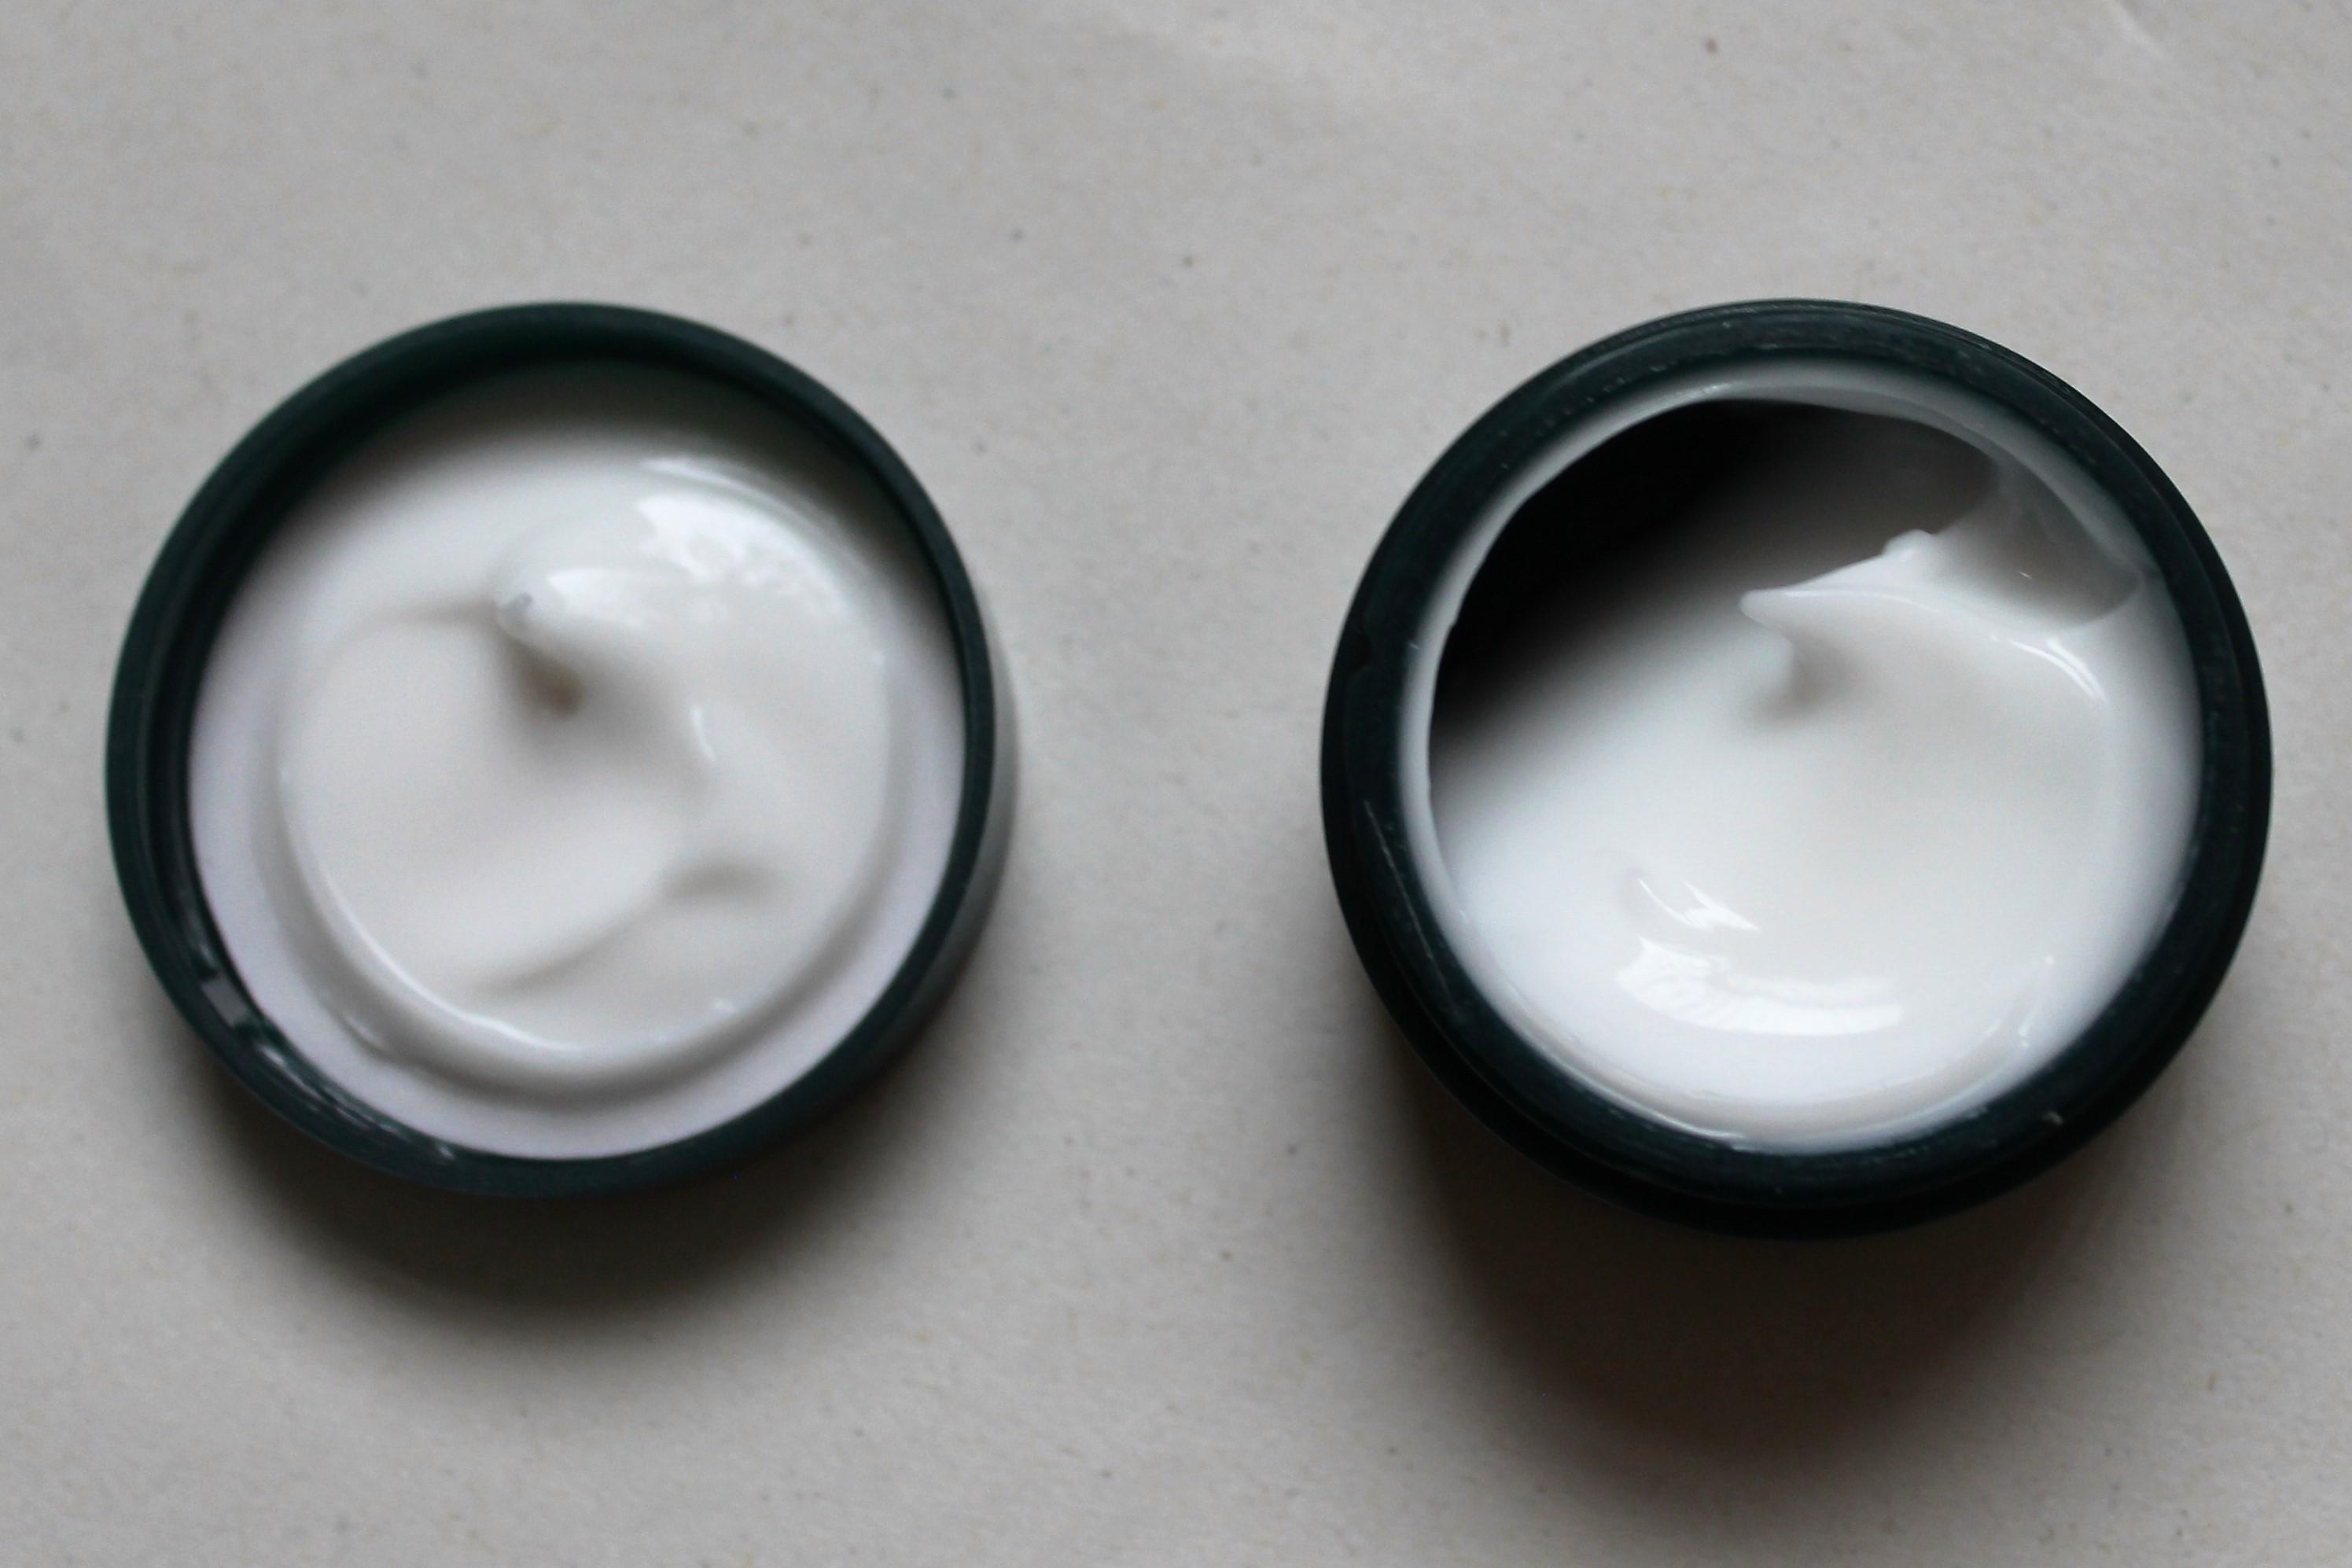 Clarks Botanicals Marine Cream